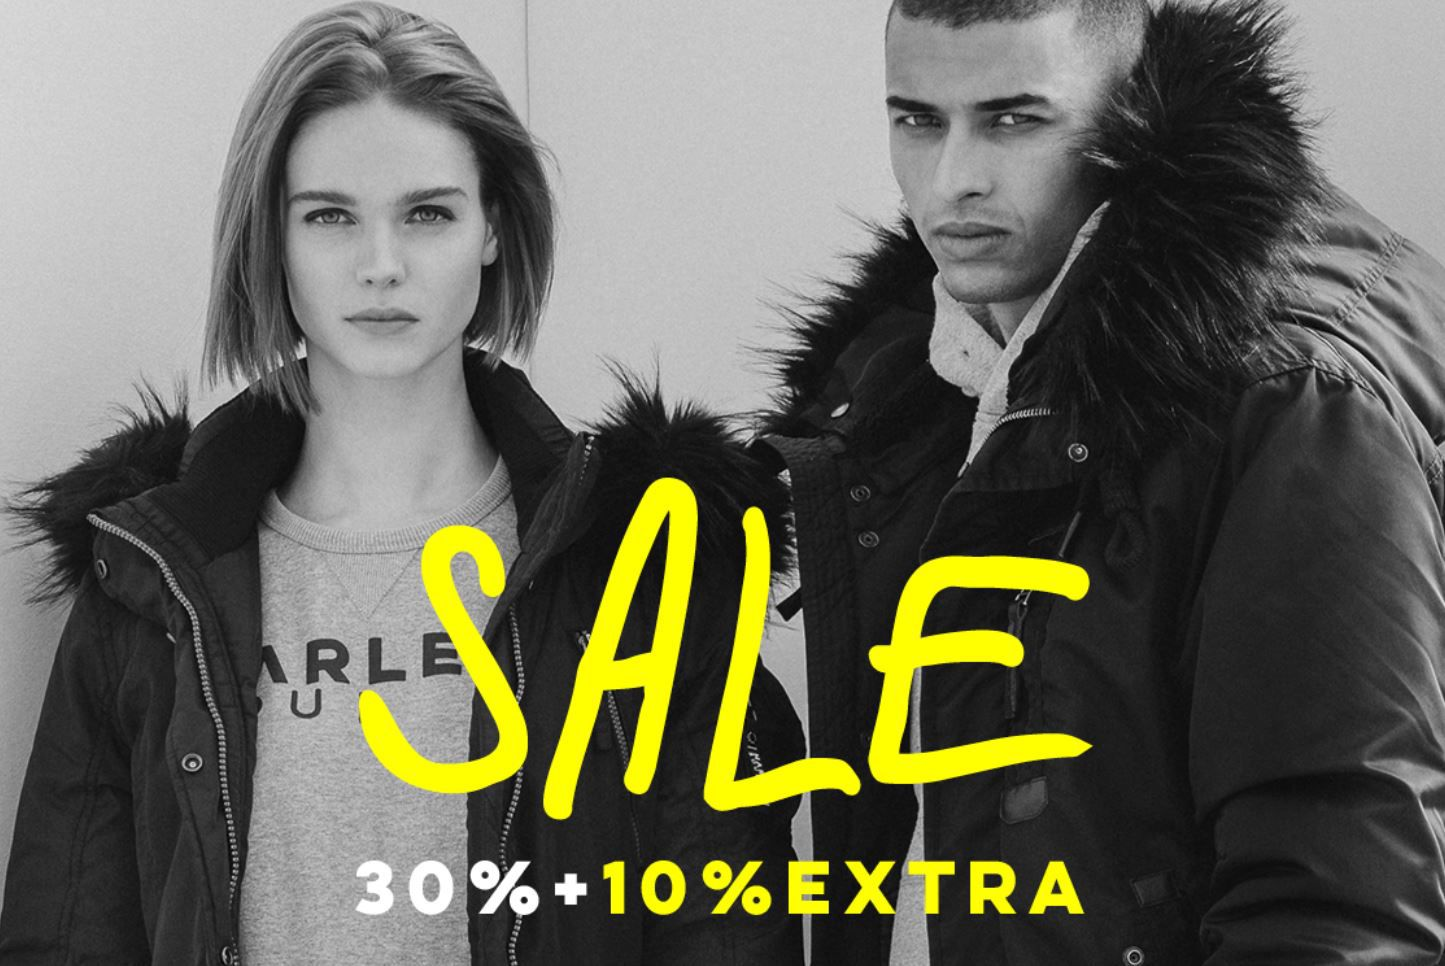 Camp David & Soccx Single Day Sale mit 30% + 10% extra nur im Sale!